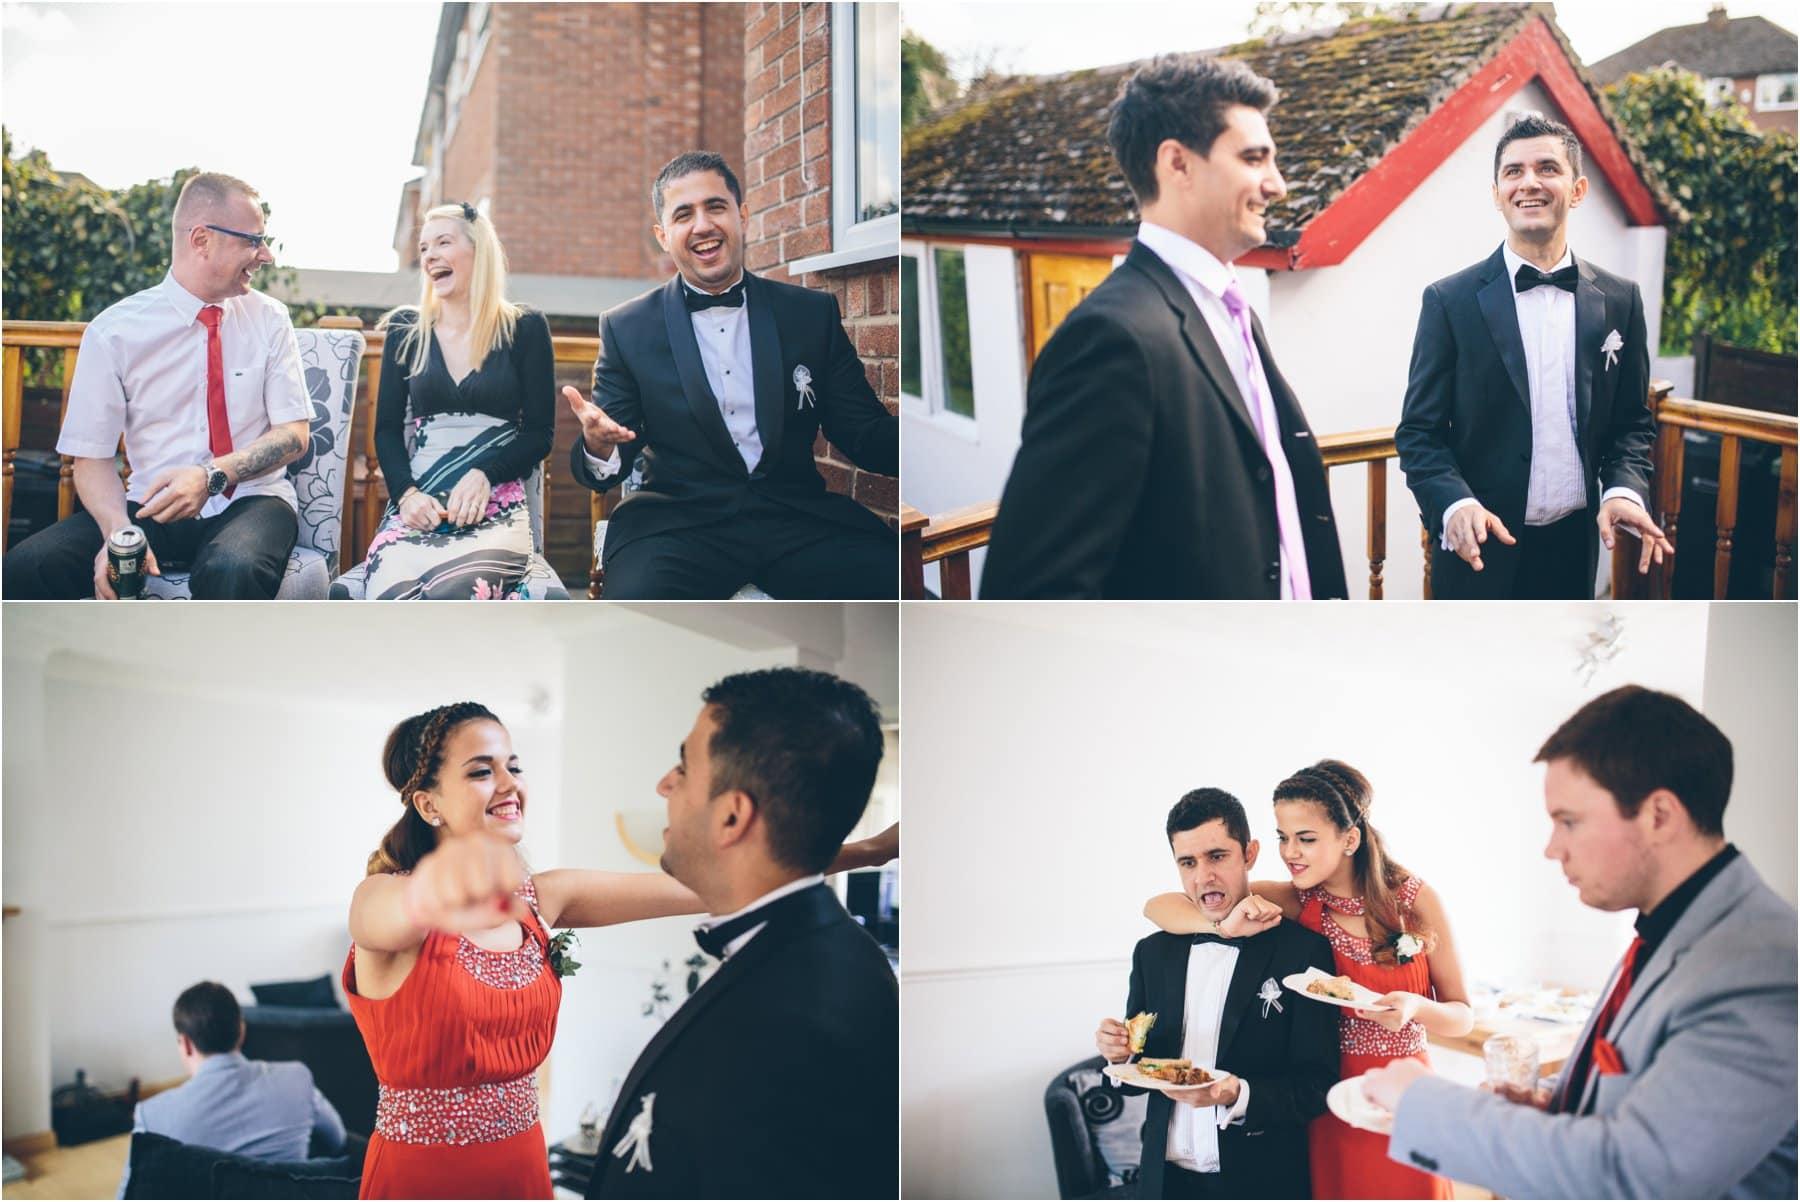 Midland_Manchester_Wedding_Photography_0015